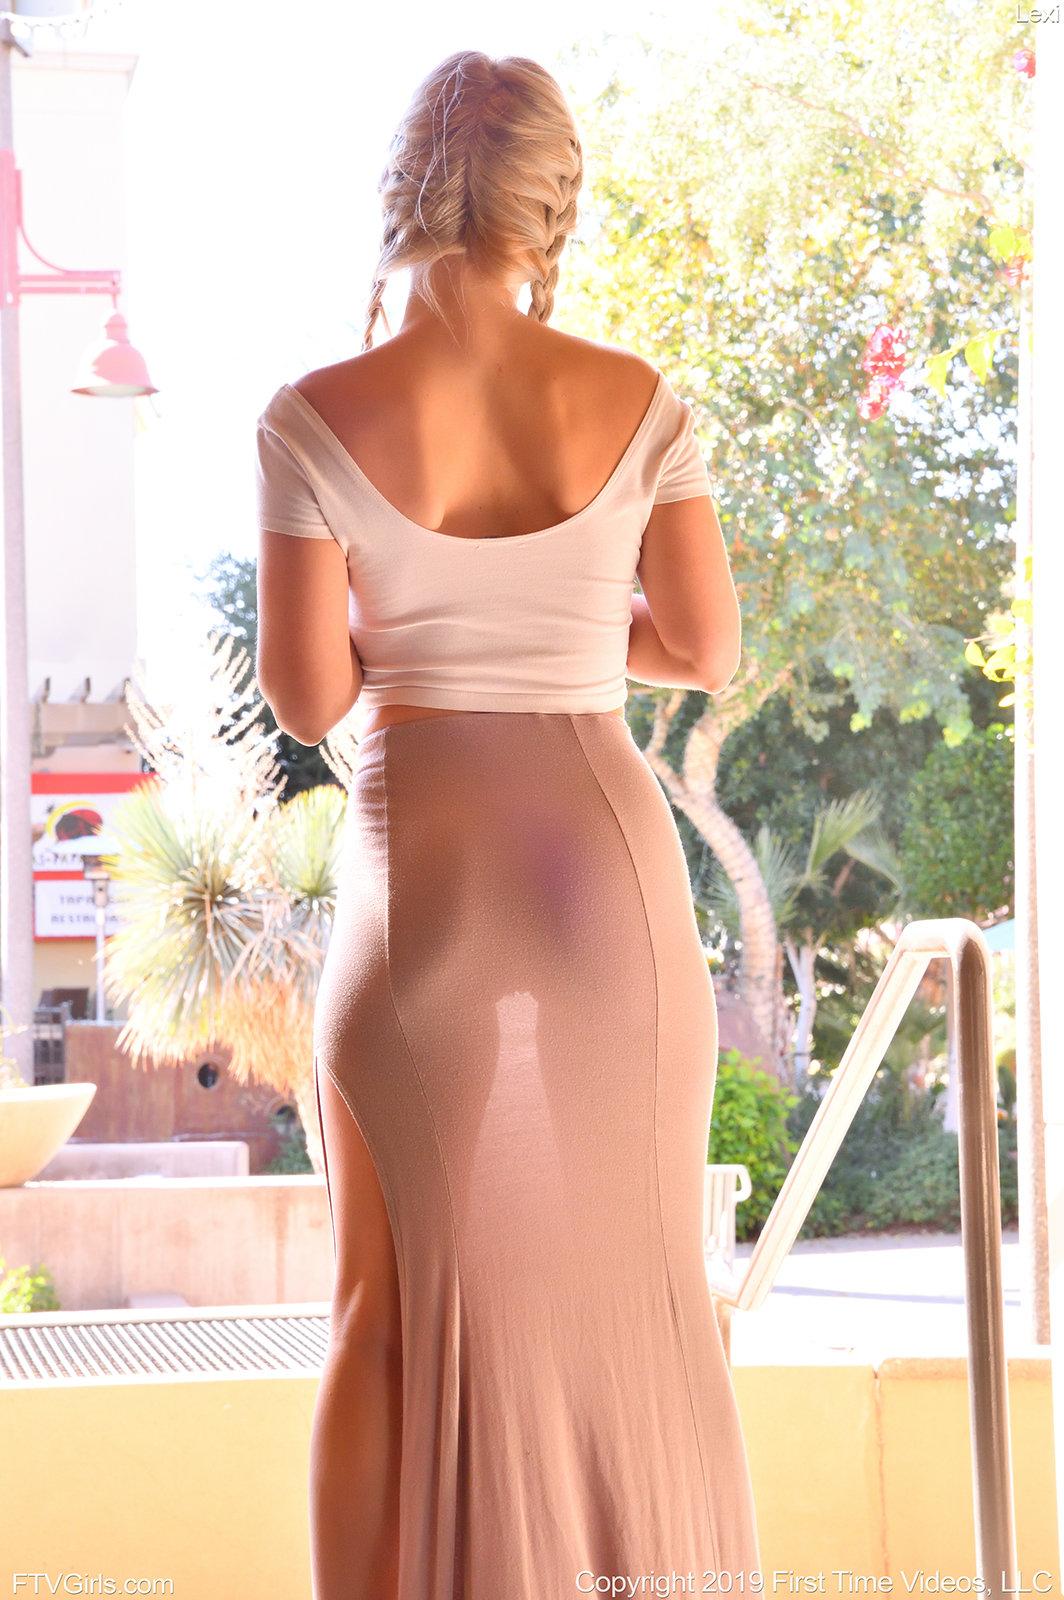 Lexi In See Through Fashion By Ftv Girls 16 Photos -3706